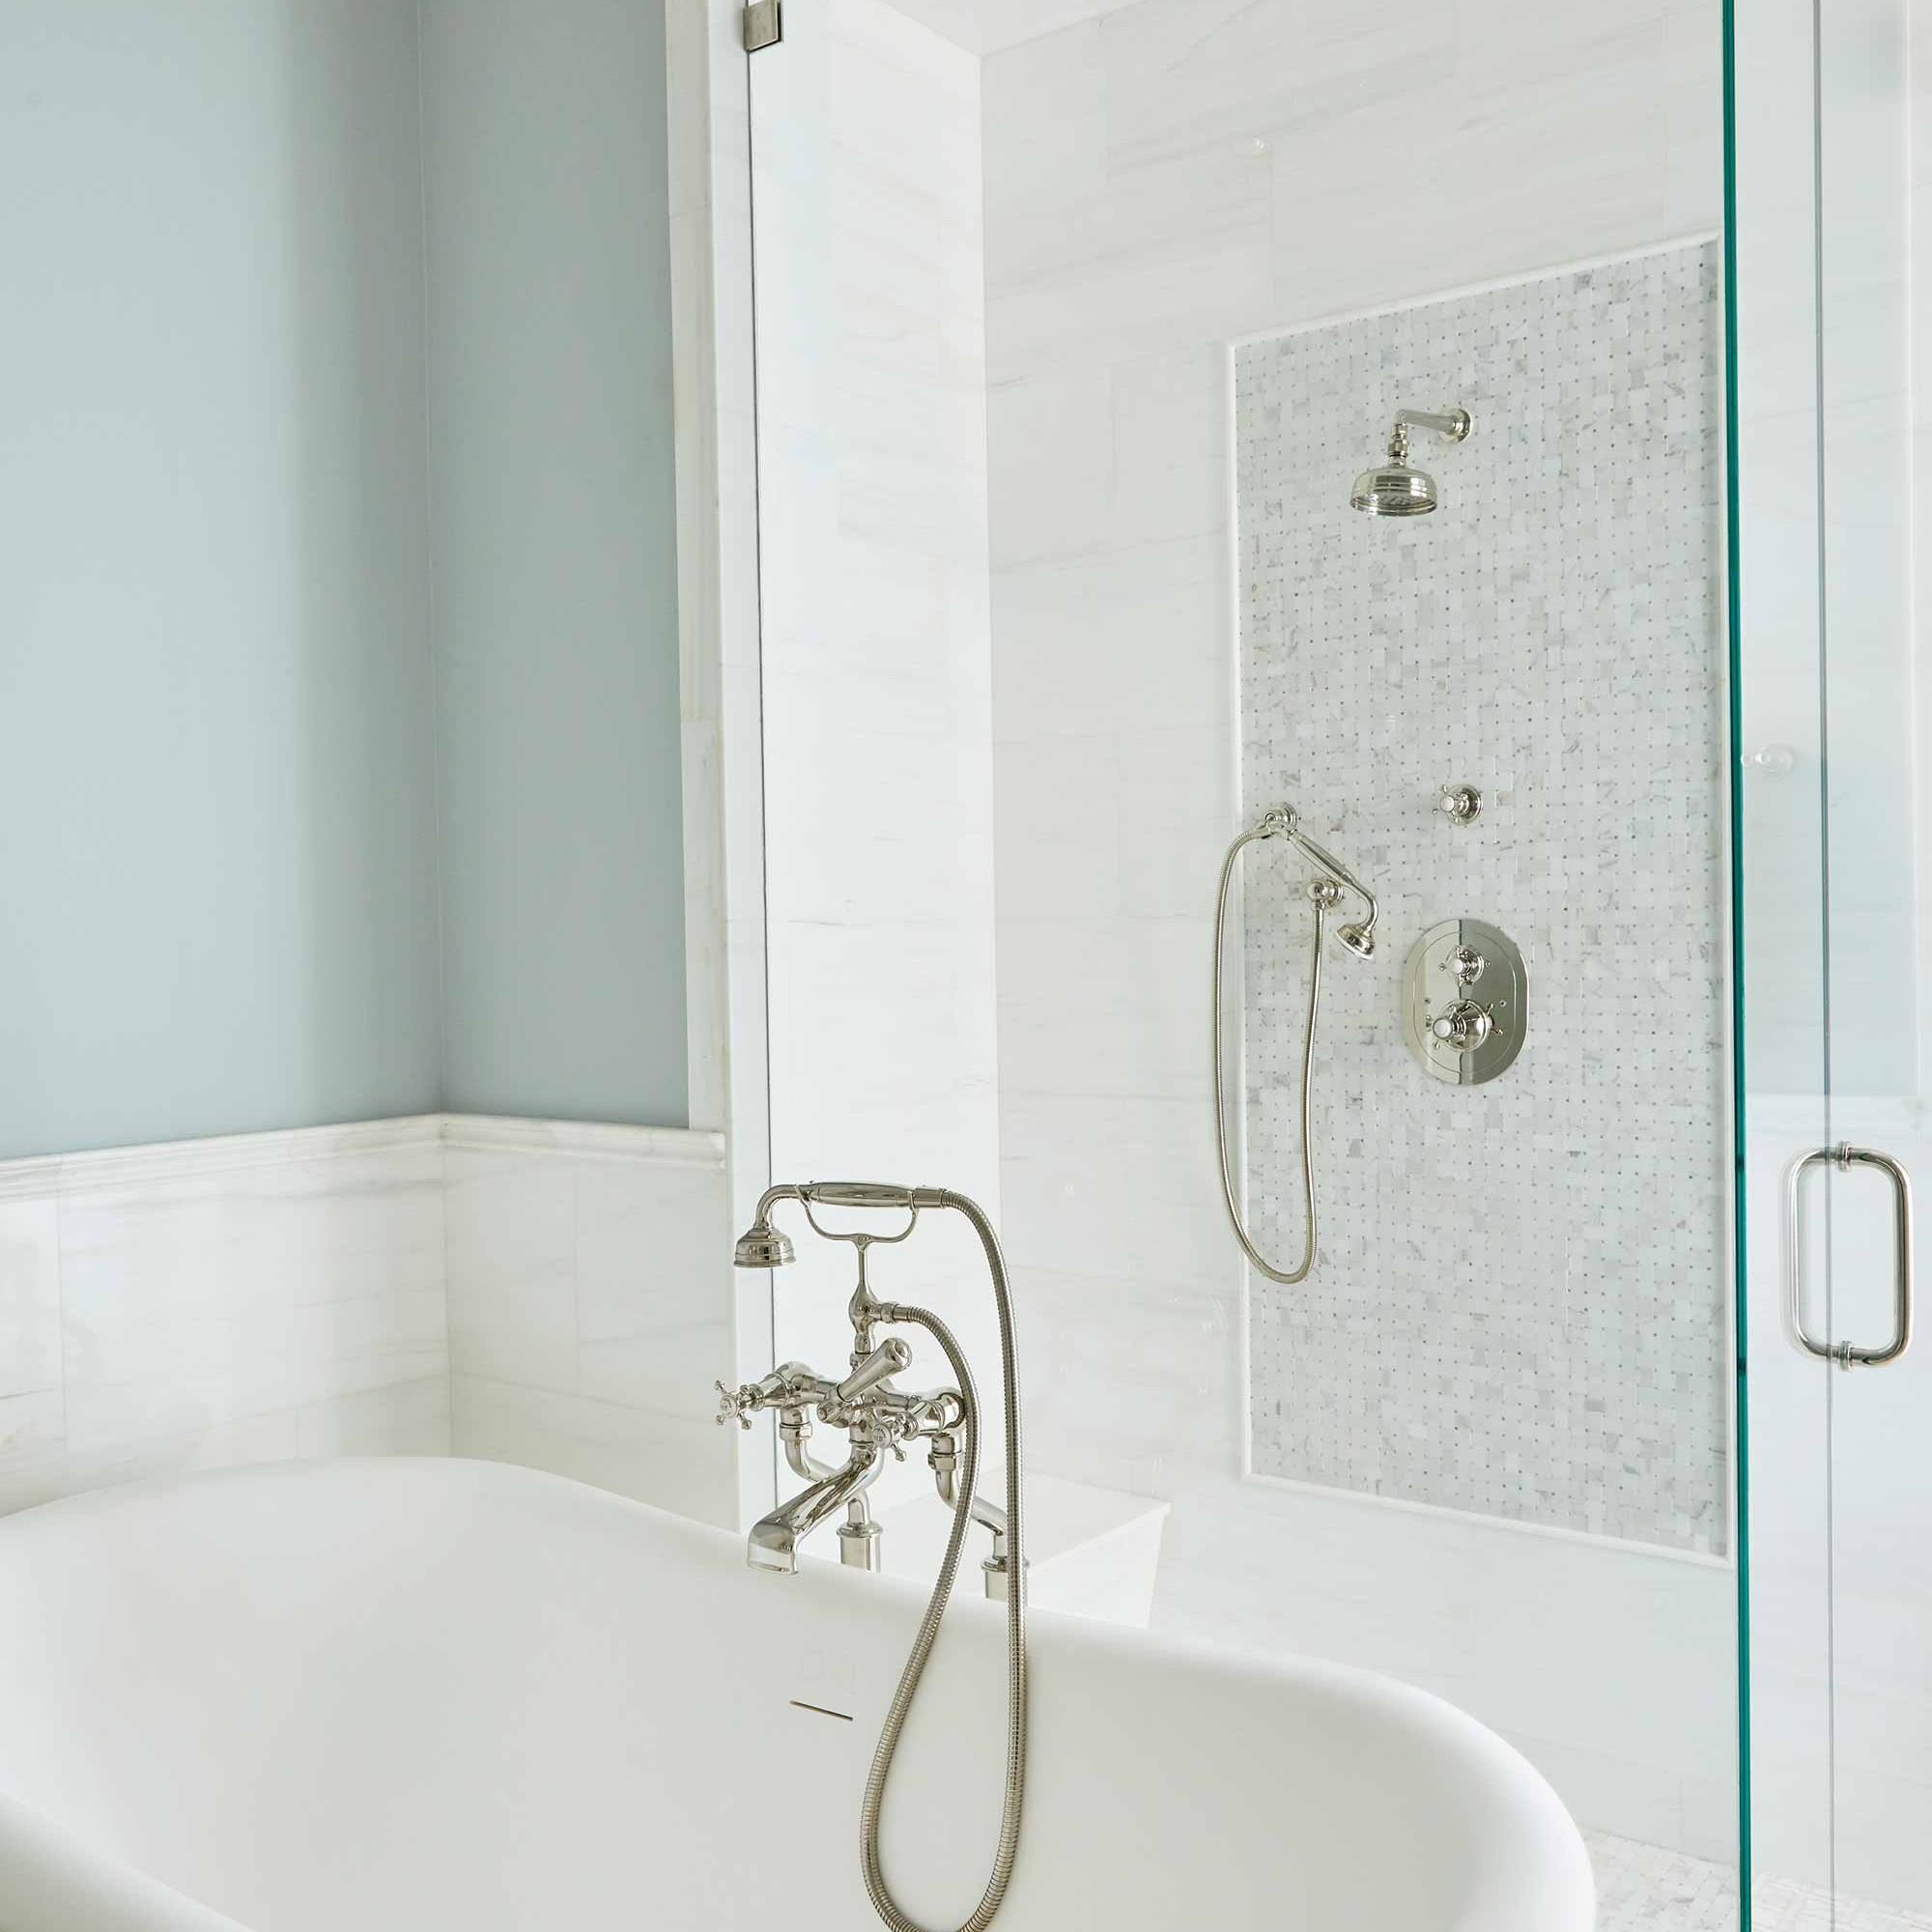 Beach style bathroom design by NYC's top interior design firm Darci Hether New York